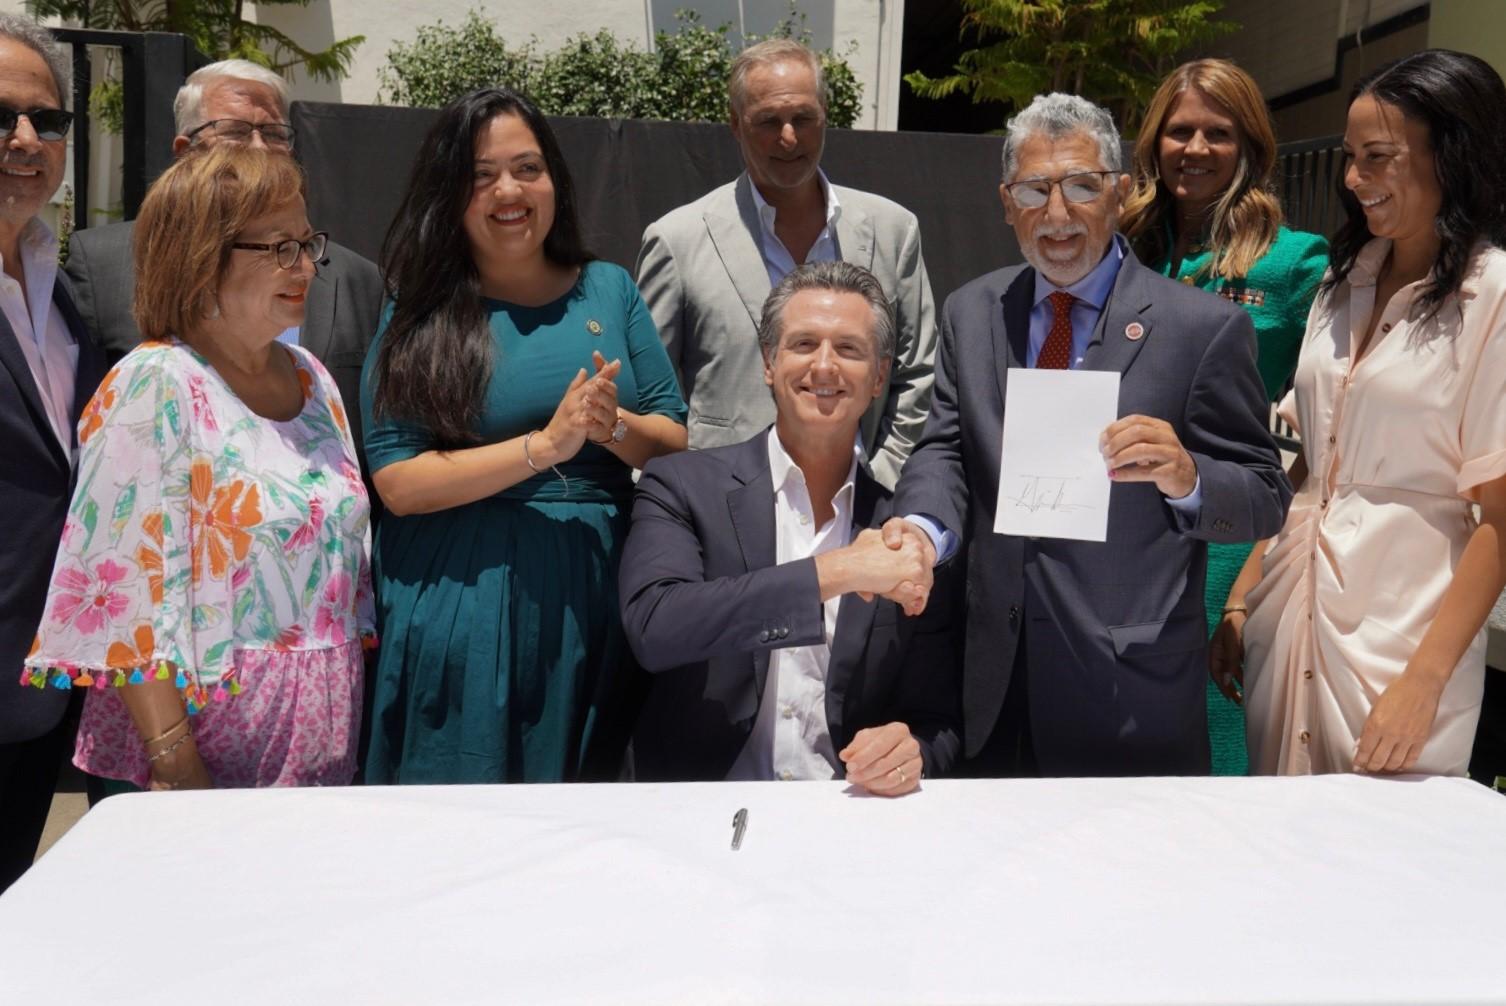 Governor alongside legislators and film and tv industry leaders